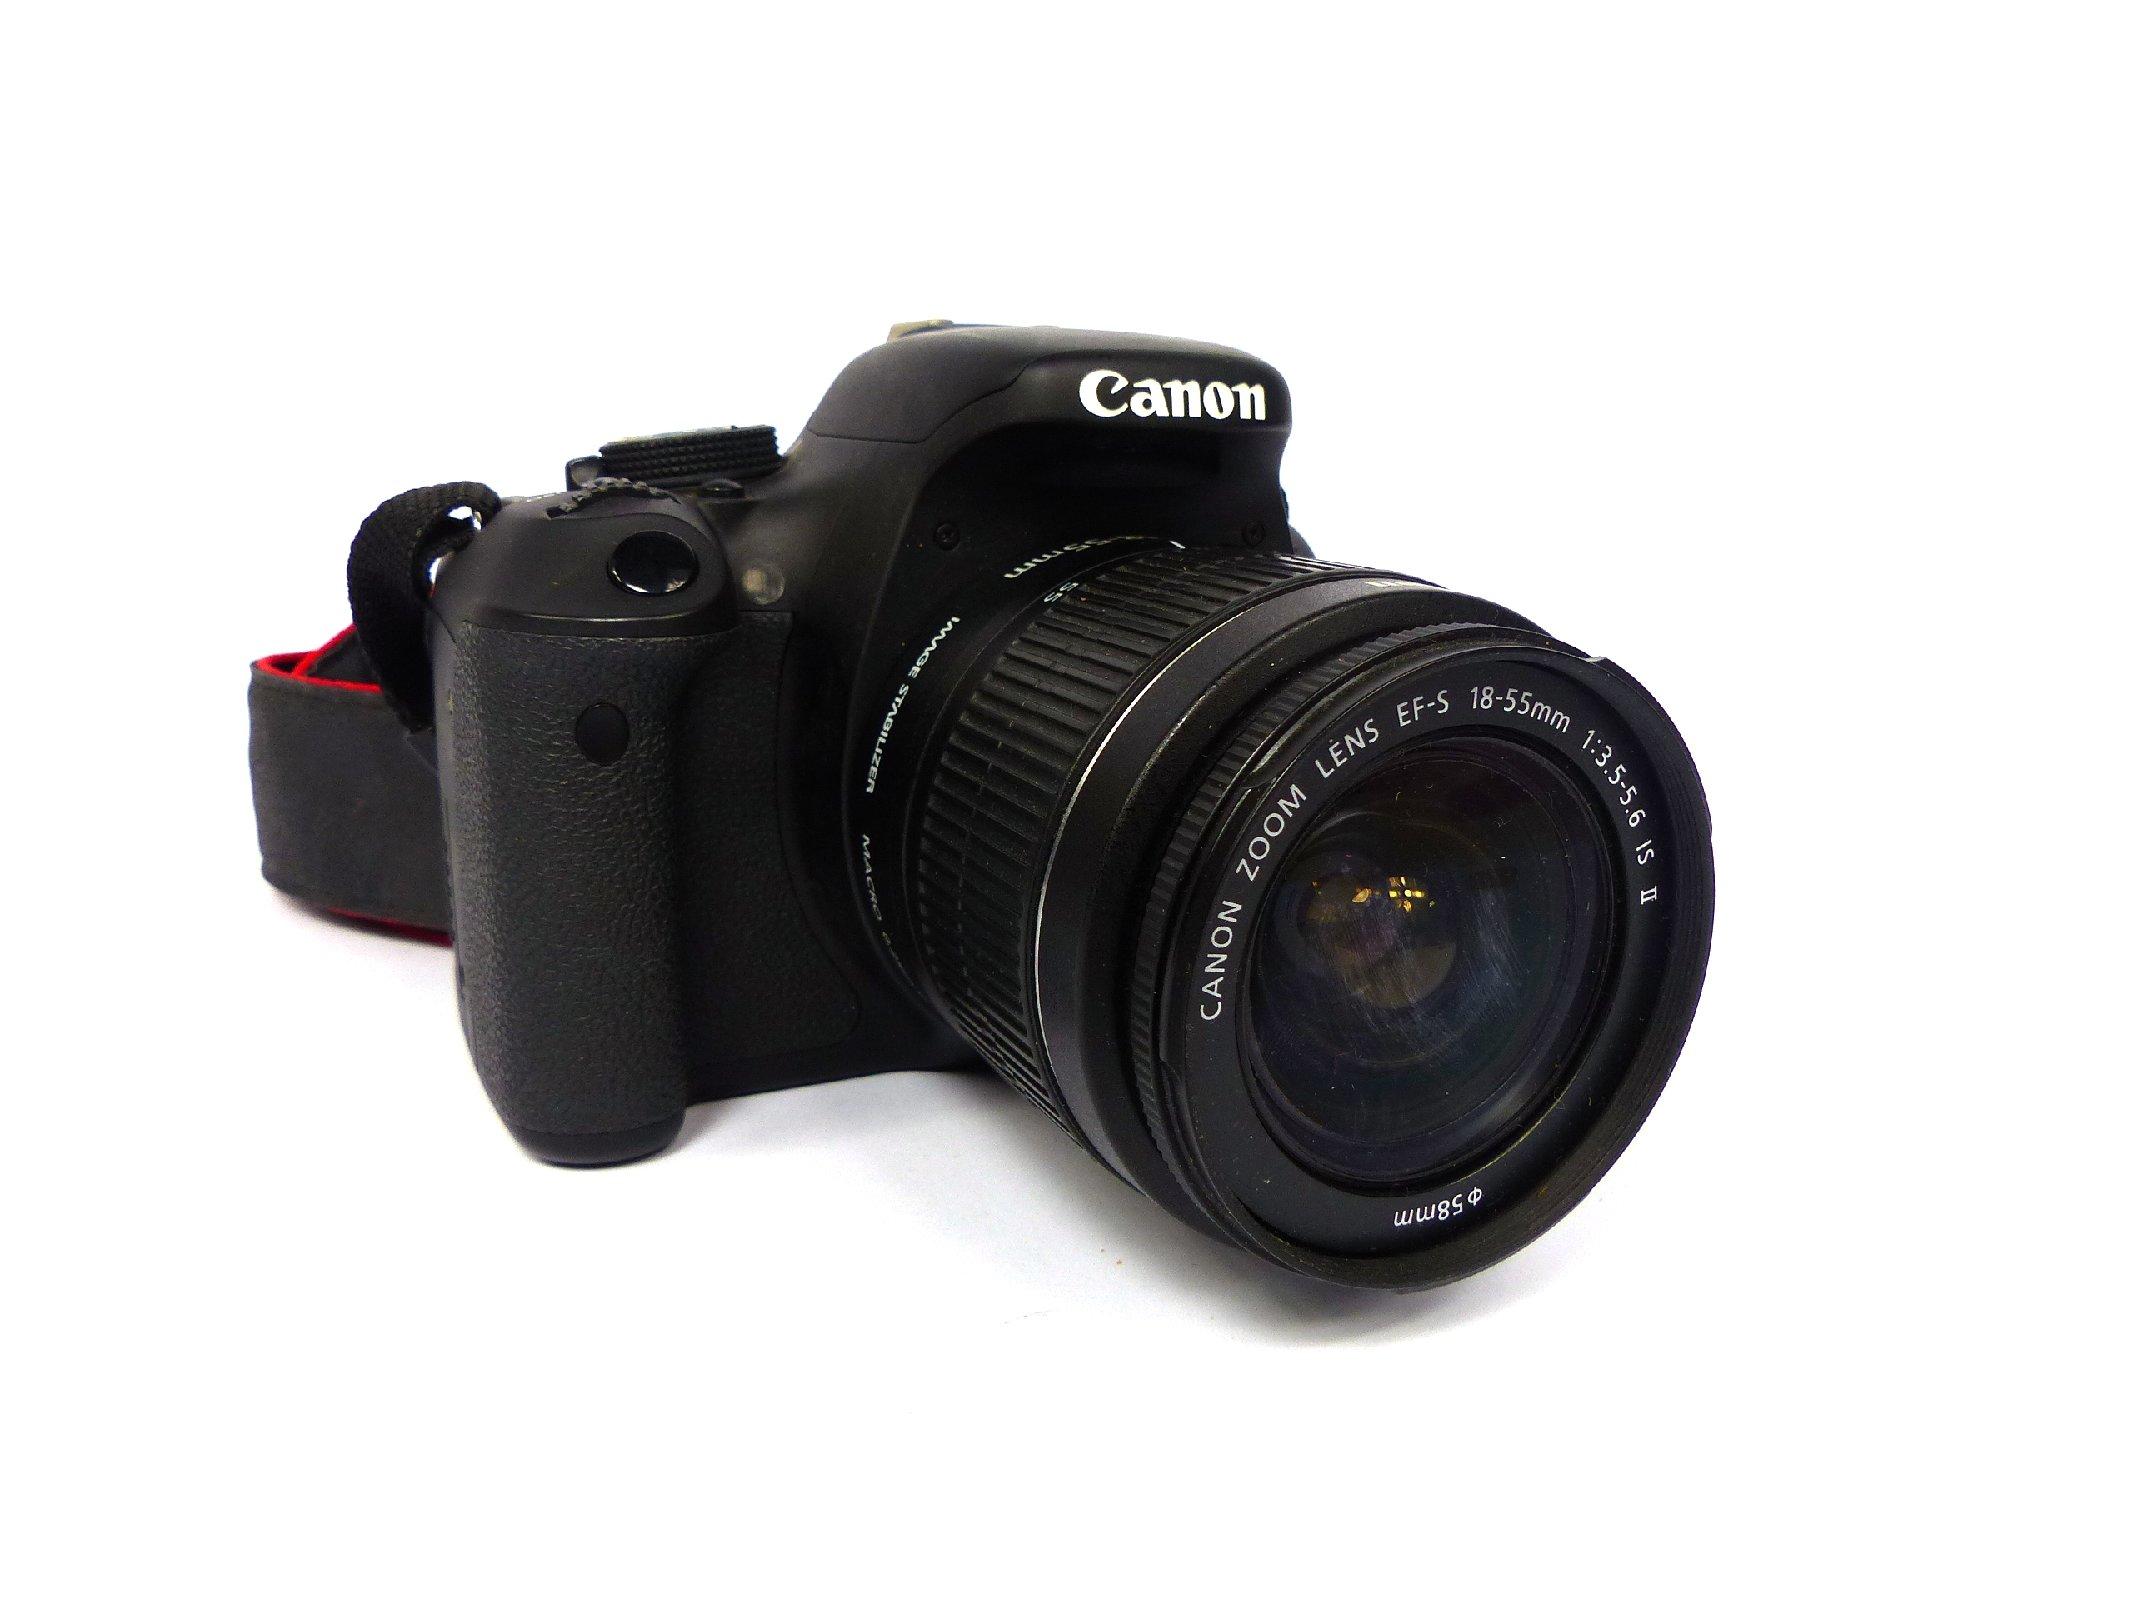 Canon eos 600d spiegelreflexkamera spiegelreflex kamara 18 for Housse canon eos 600d